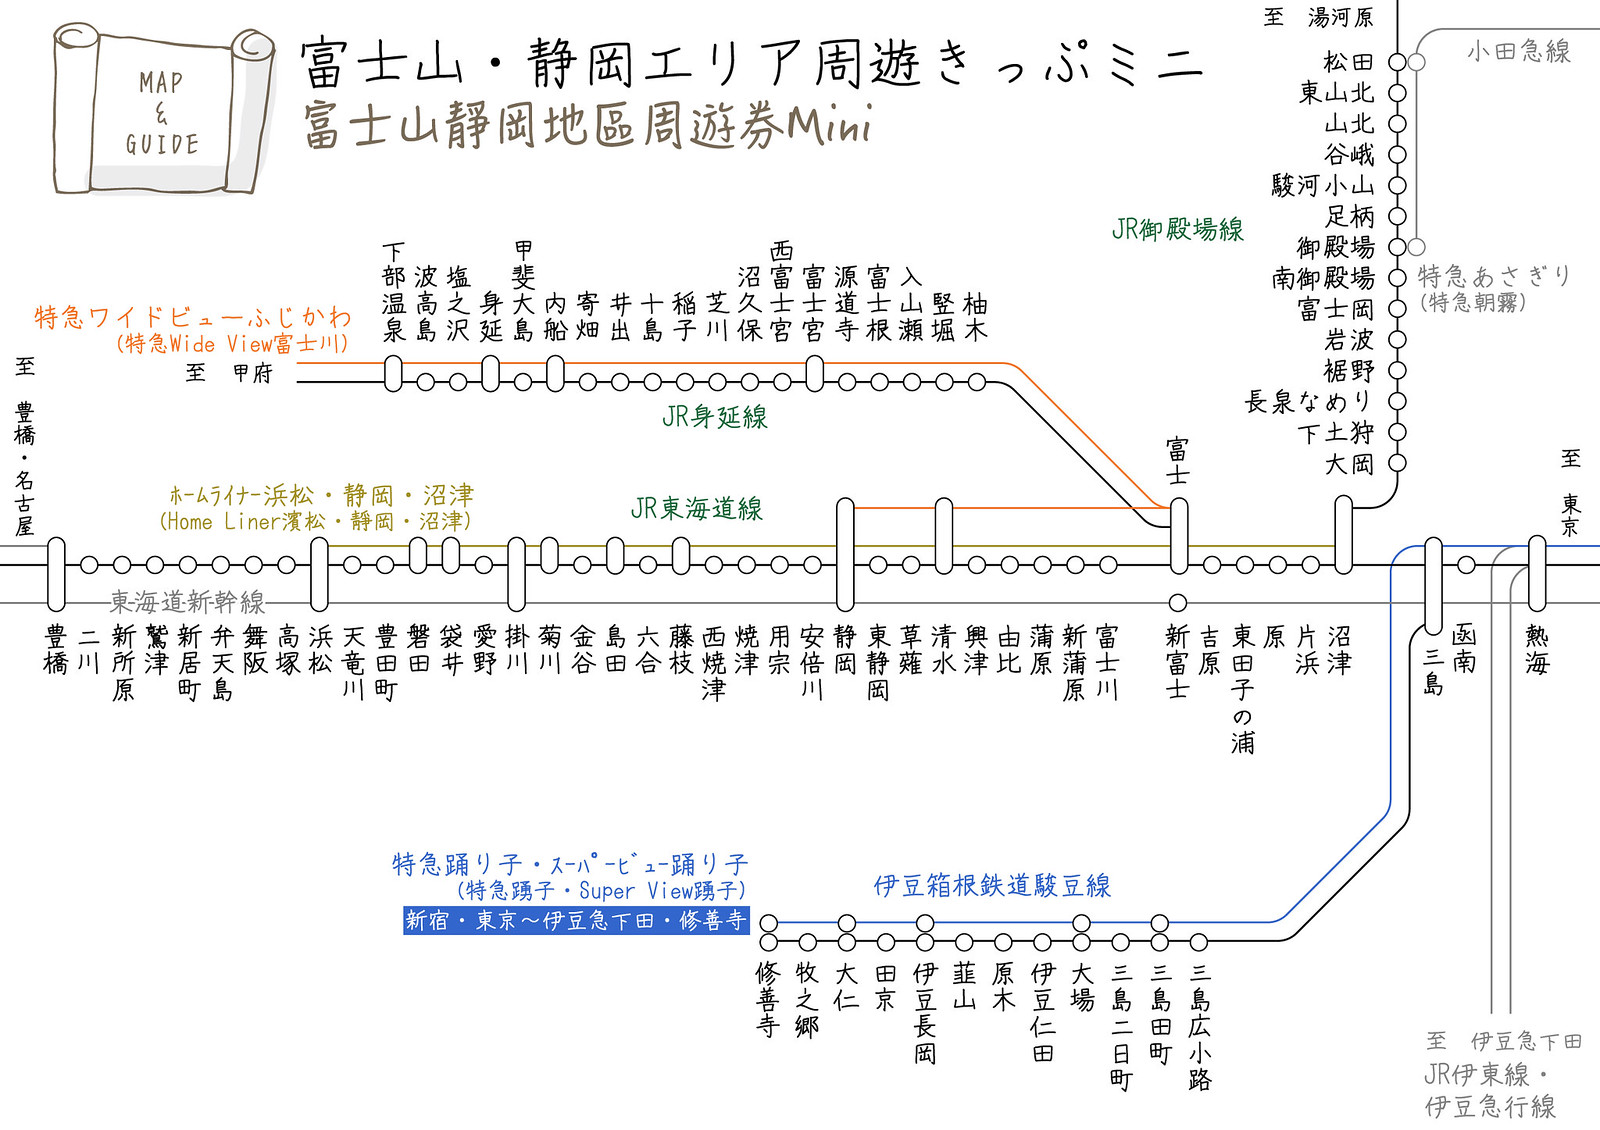 fujisan_shizuoka_mini